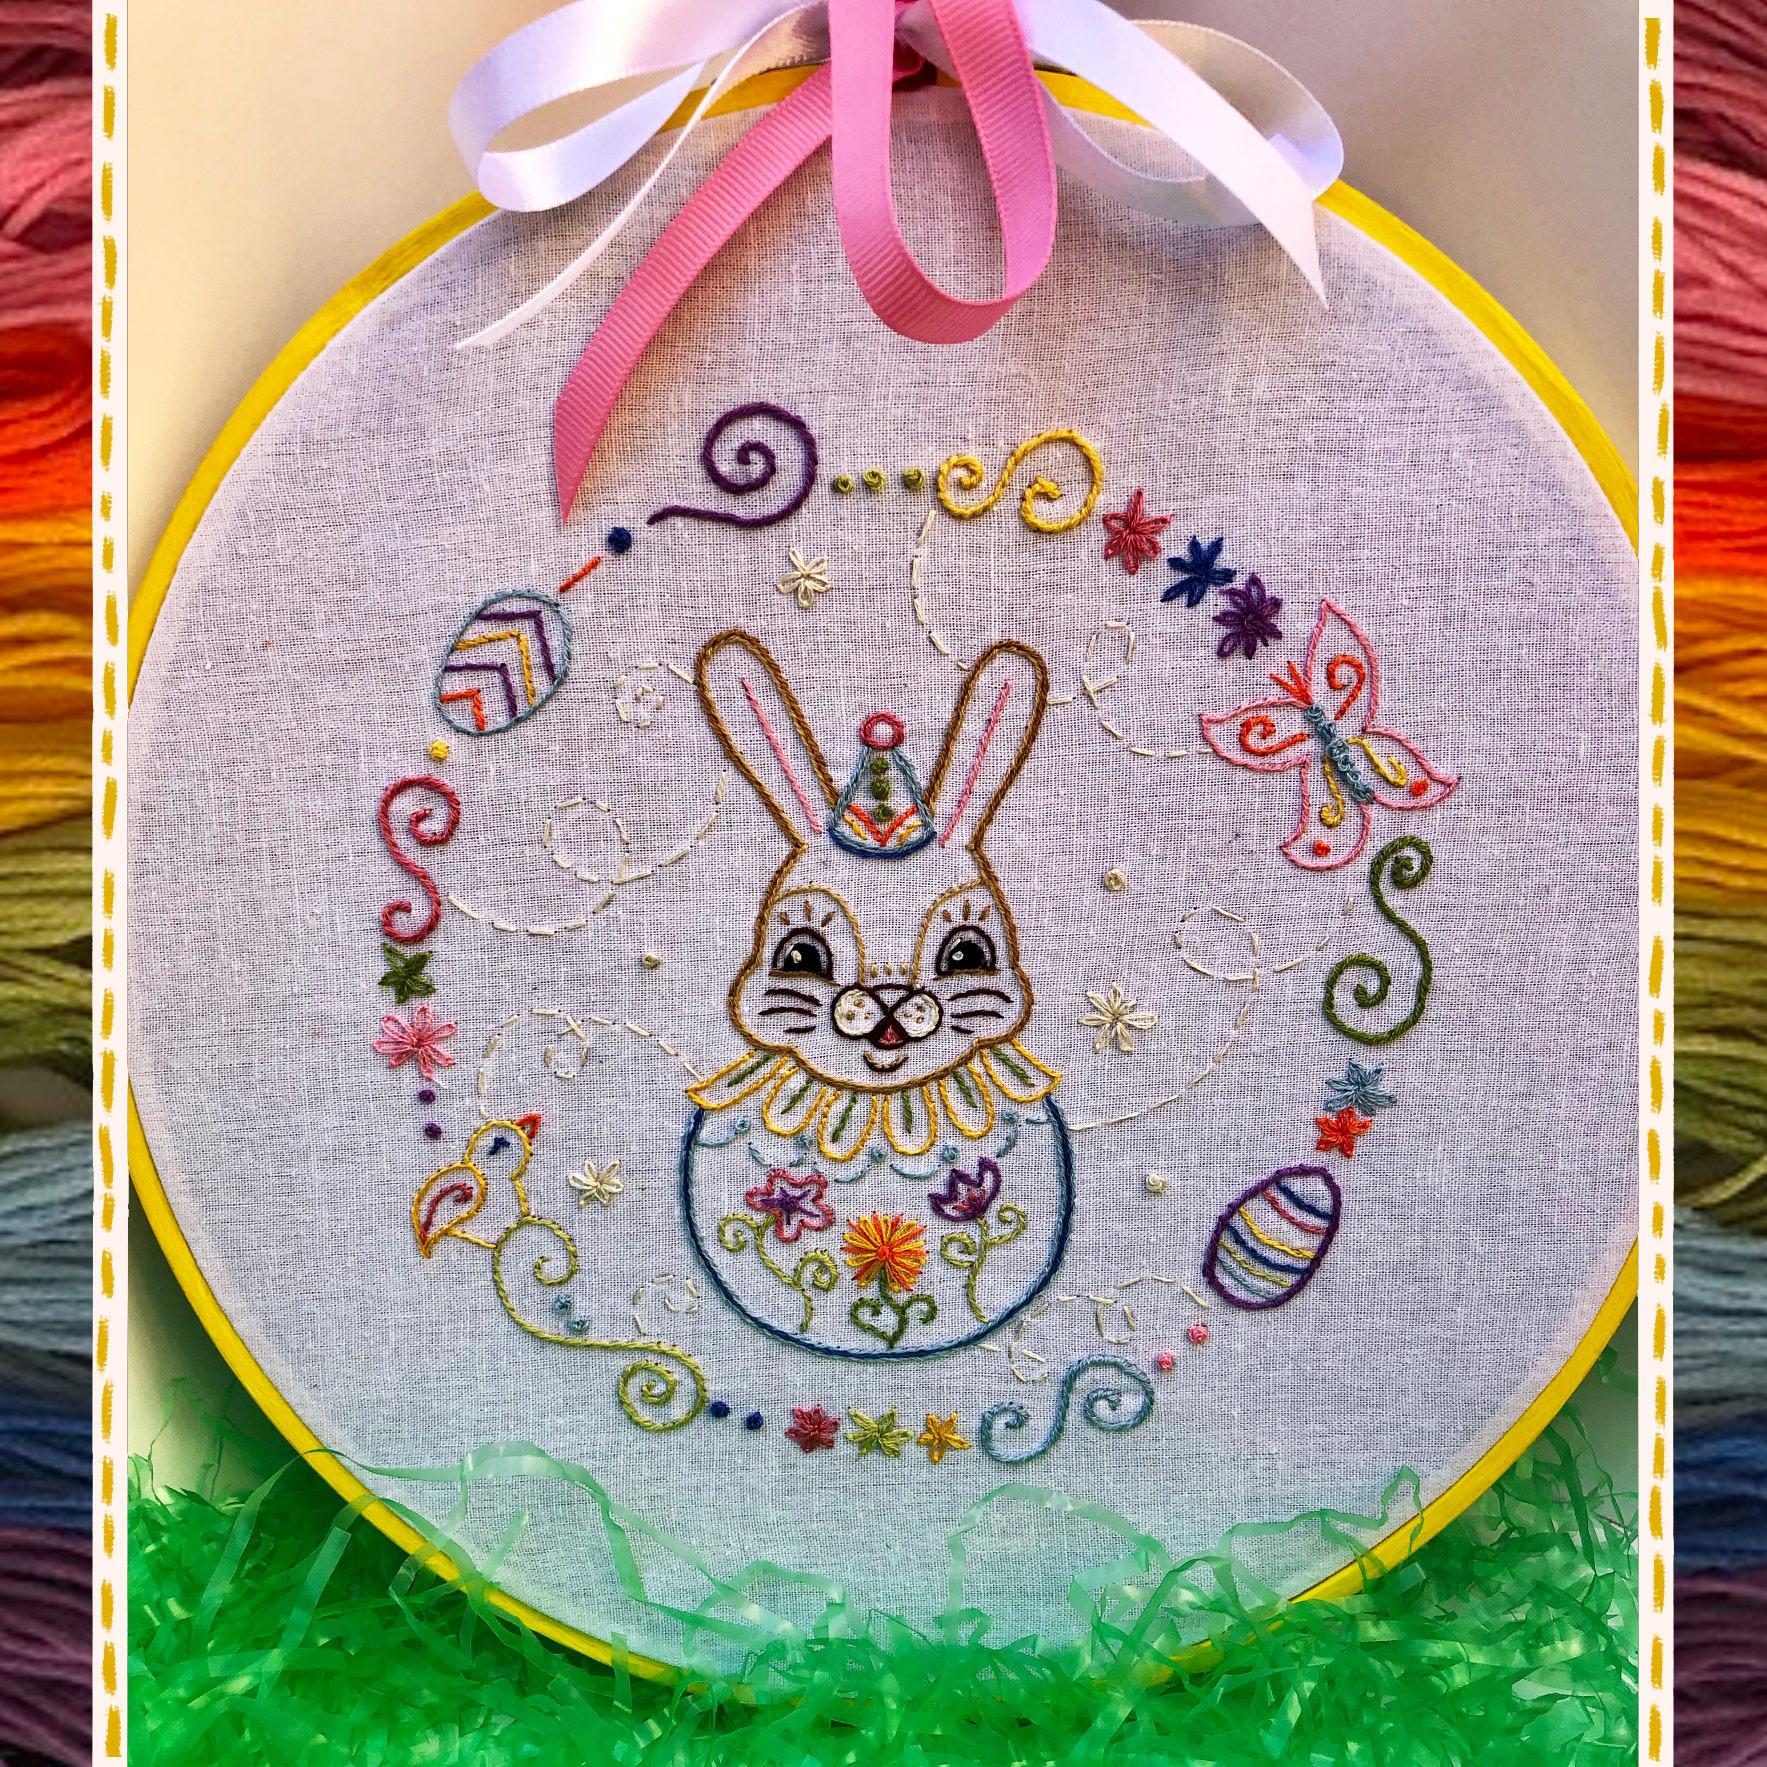 Vanilla-Bunny-Easter-Emroidery-Hoop-Elliotts-Playground-Johanna-Parker.jpg